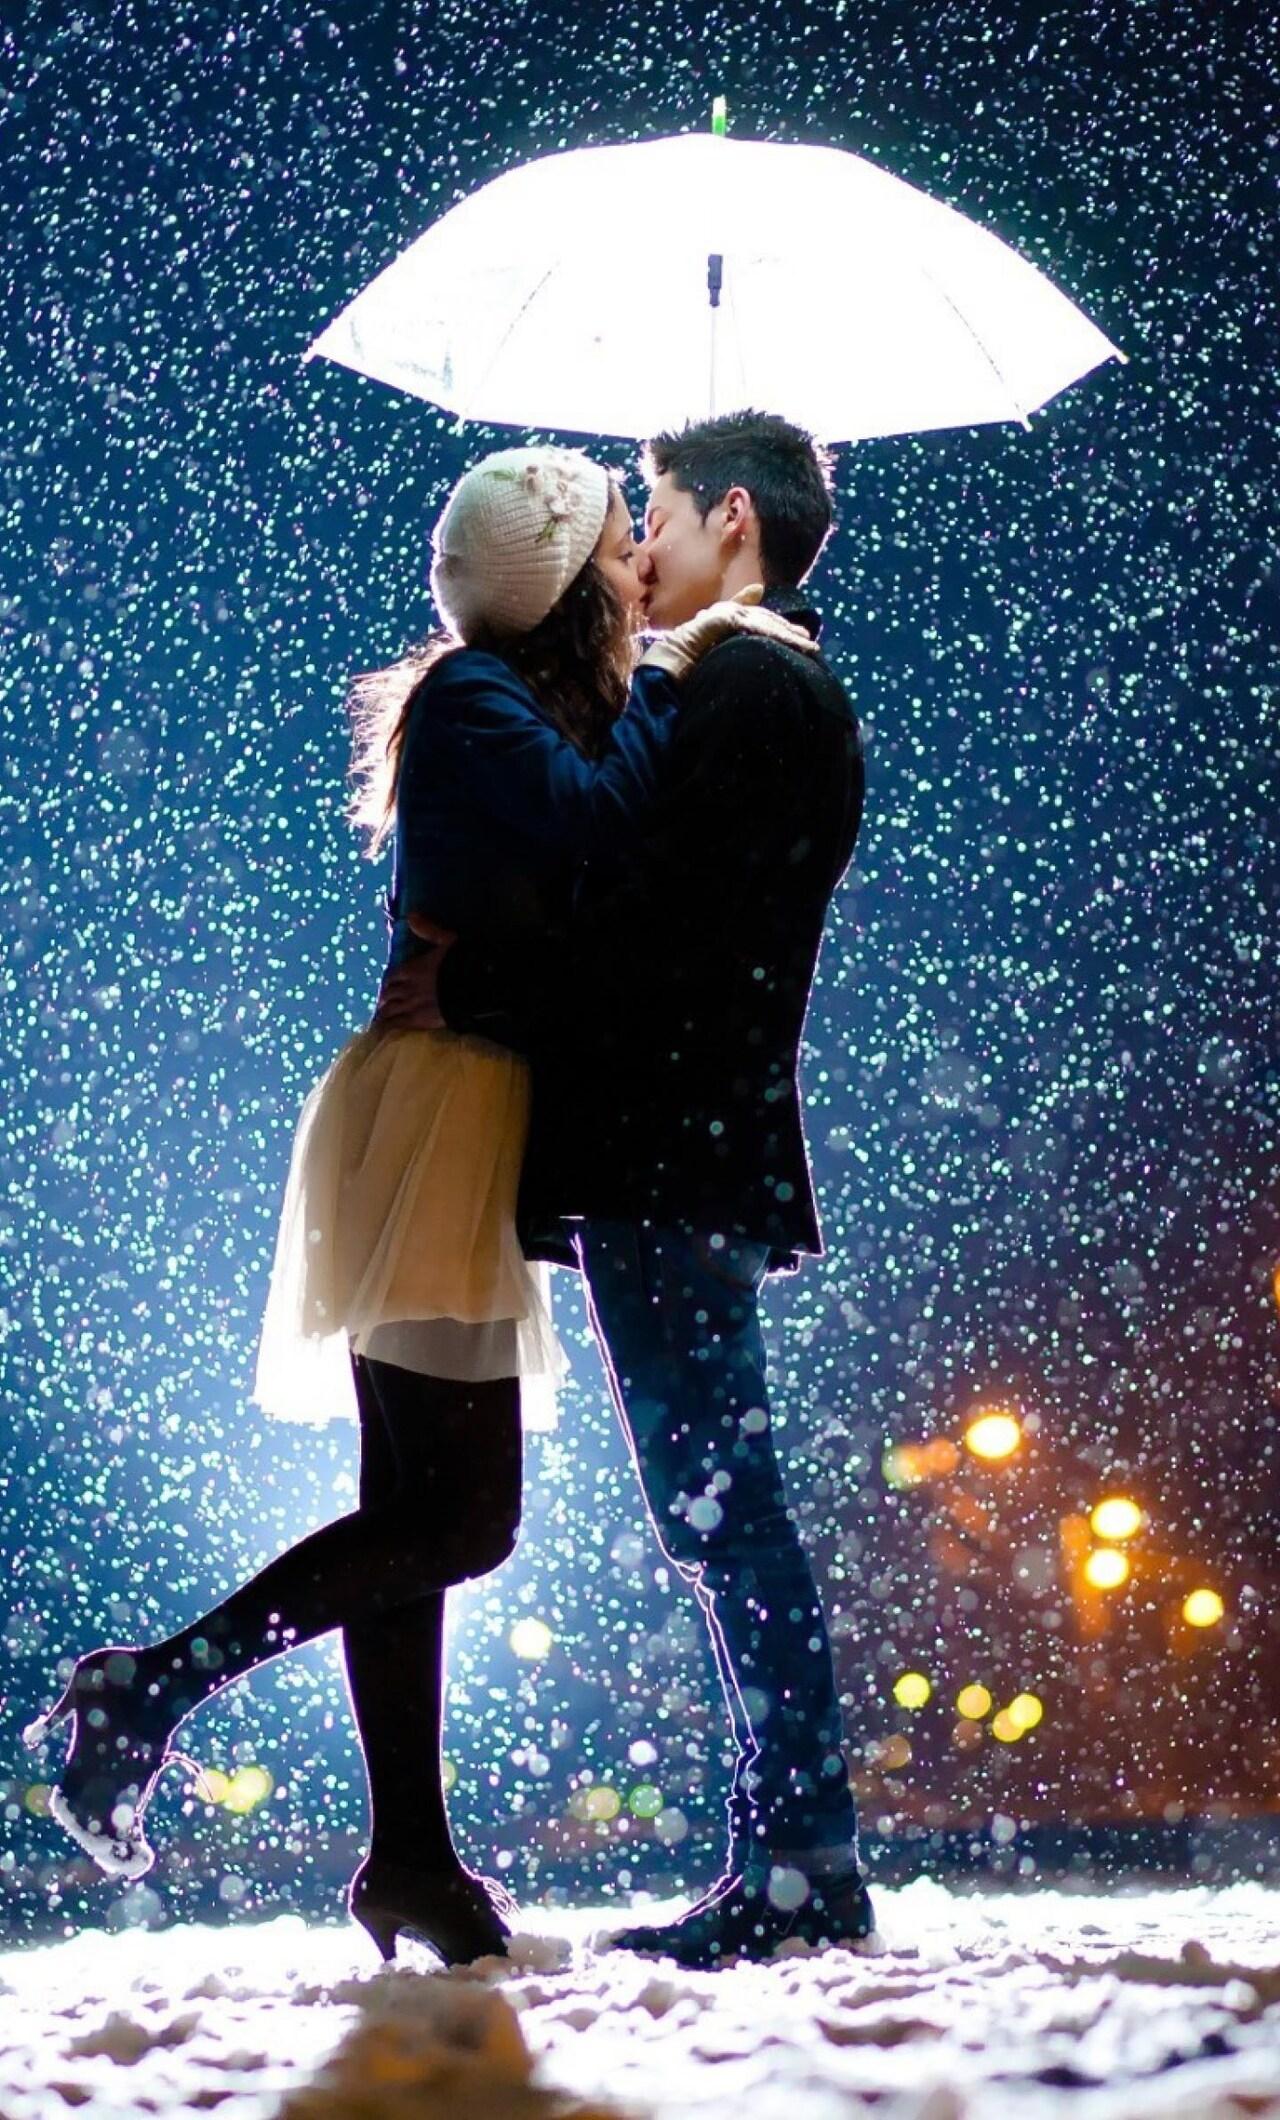 couple-kiss-in-snow.jpg